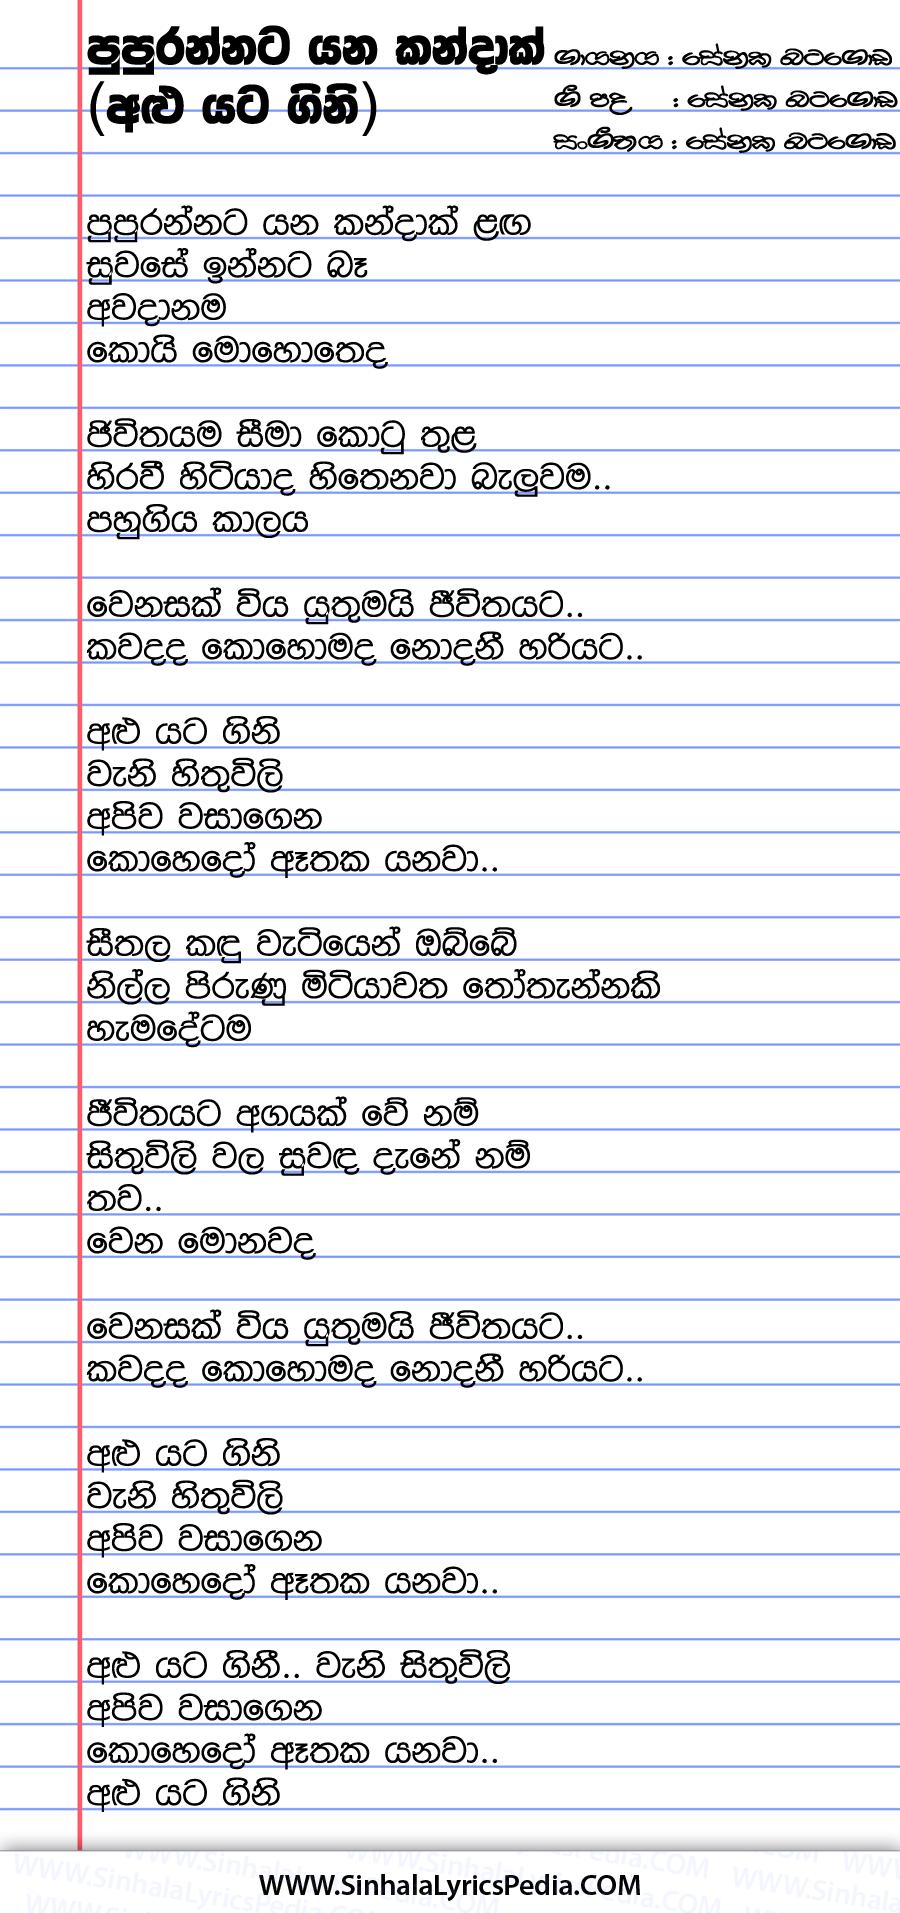 Pupurannata Yana Kandak (Alu Yata Gini) Song Lyrics